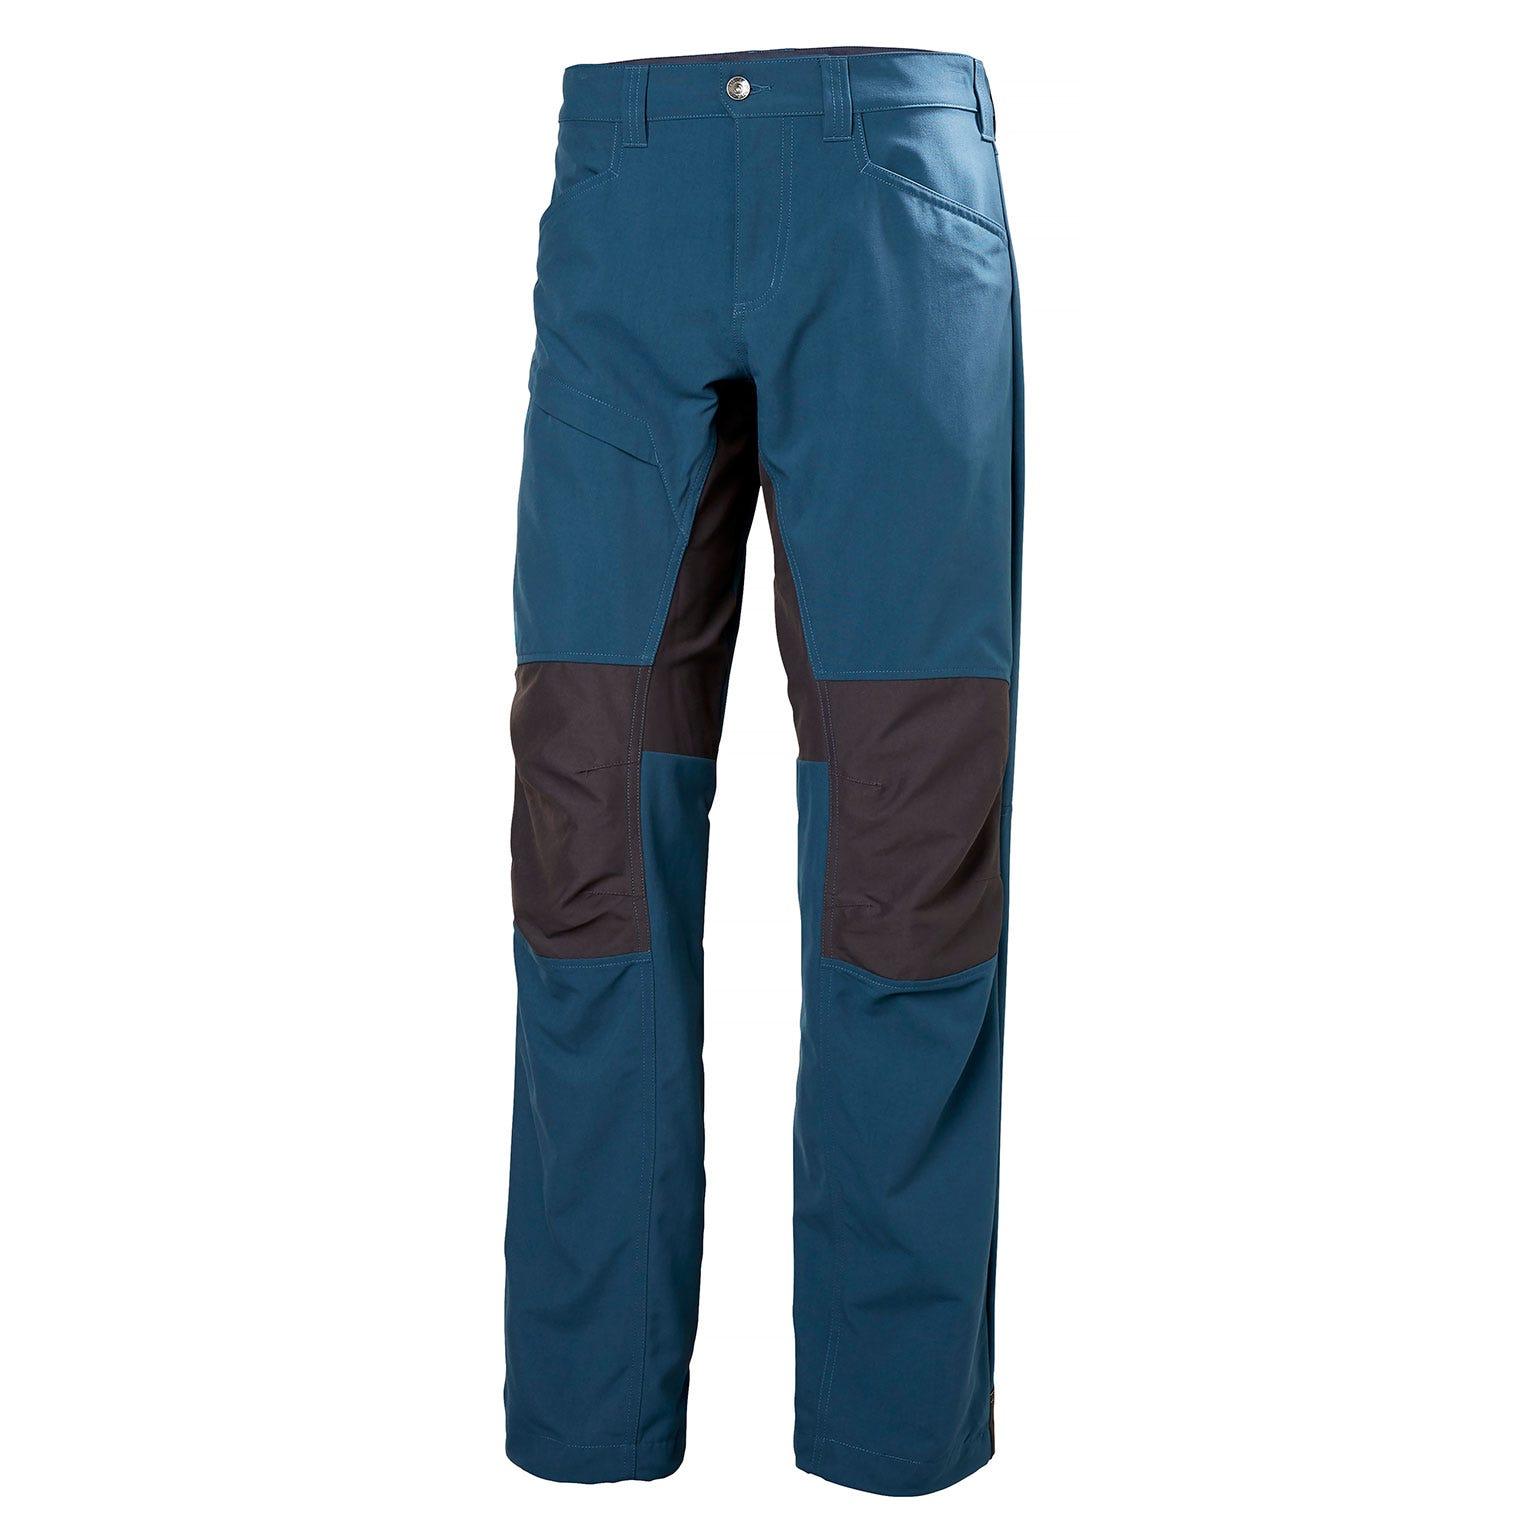 Helly Hansen Vanir Hybrid Pant Mens Hiking Blue XL